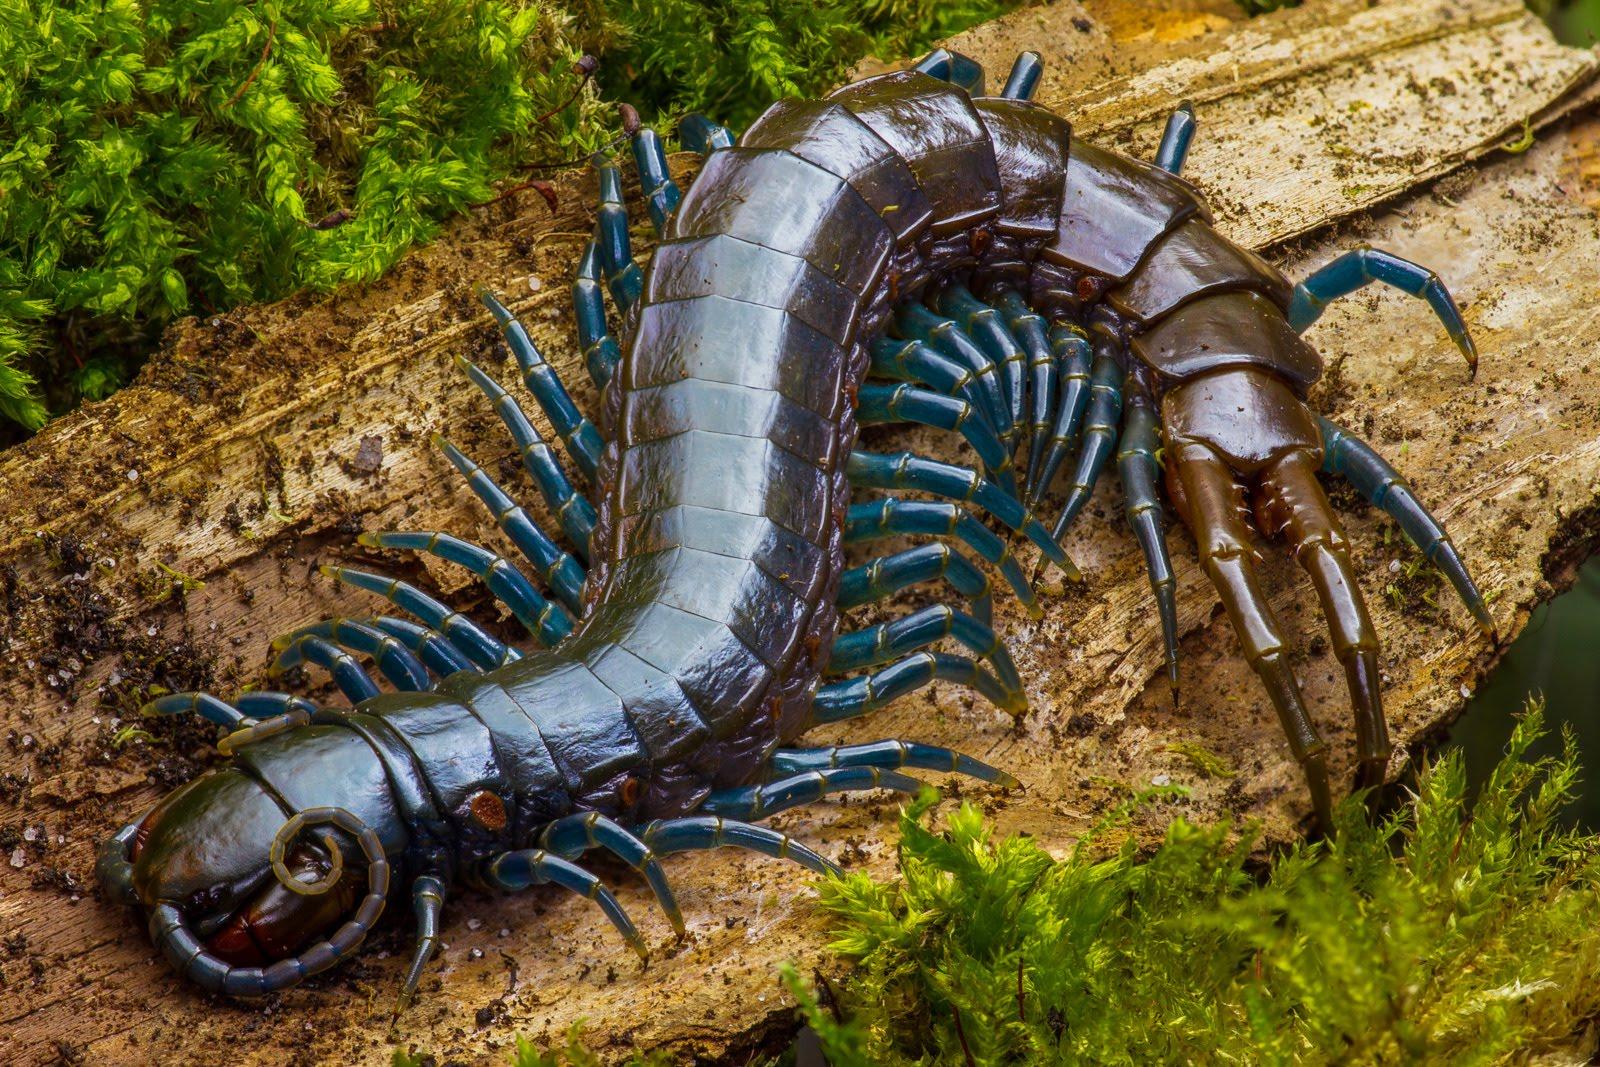 Centipede HD wallpapers, Desktop wallpaper - most viewed